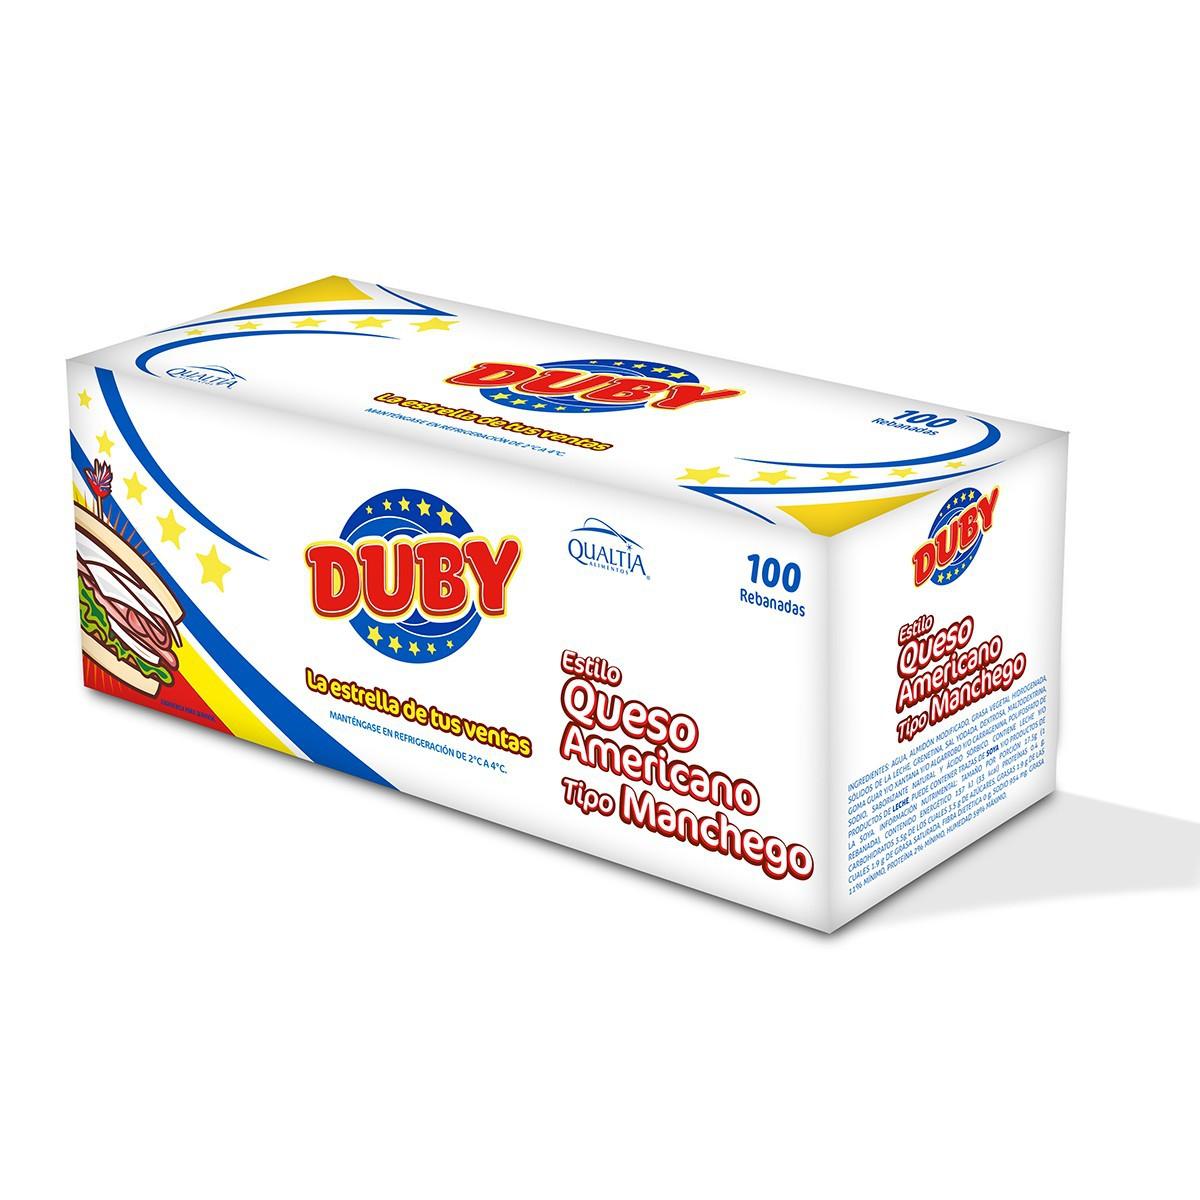 Chedraui: Rebanada de Queso Duby Manchego a $0.80